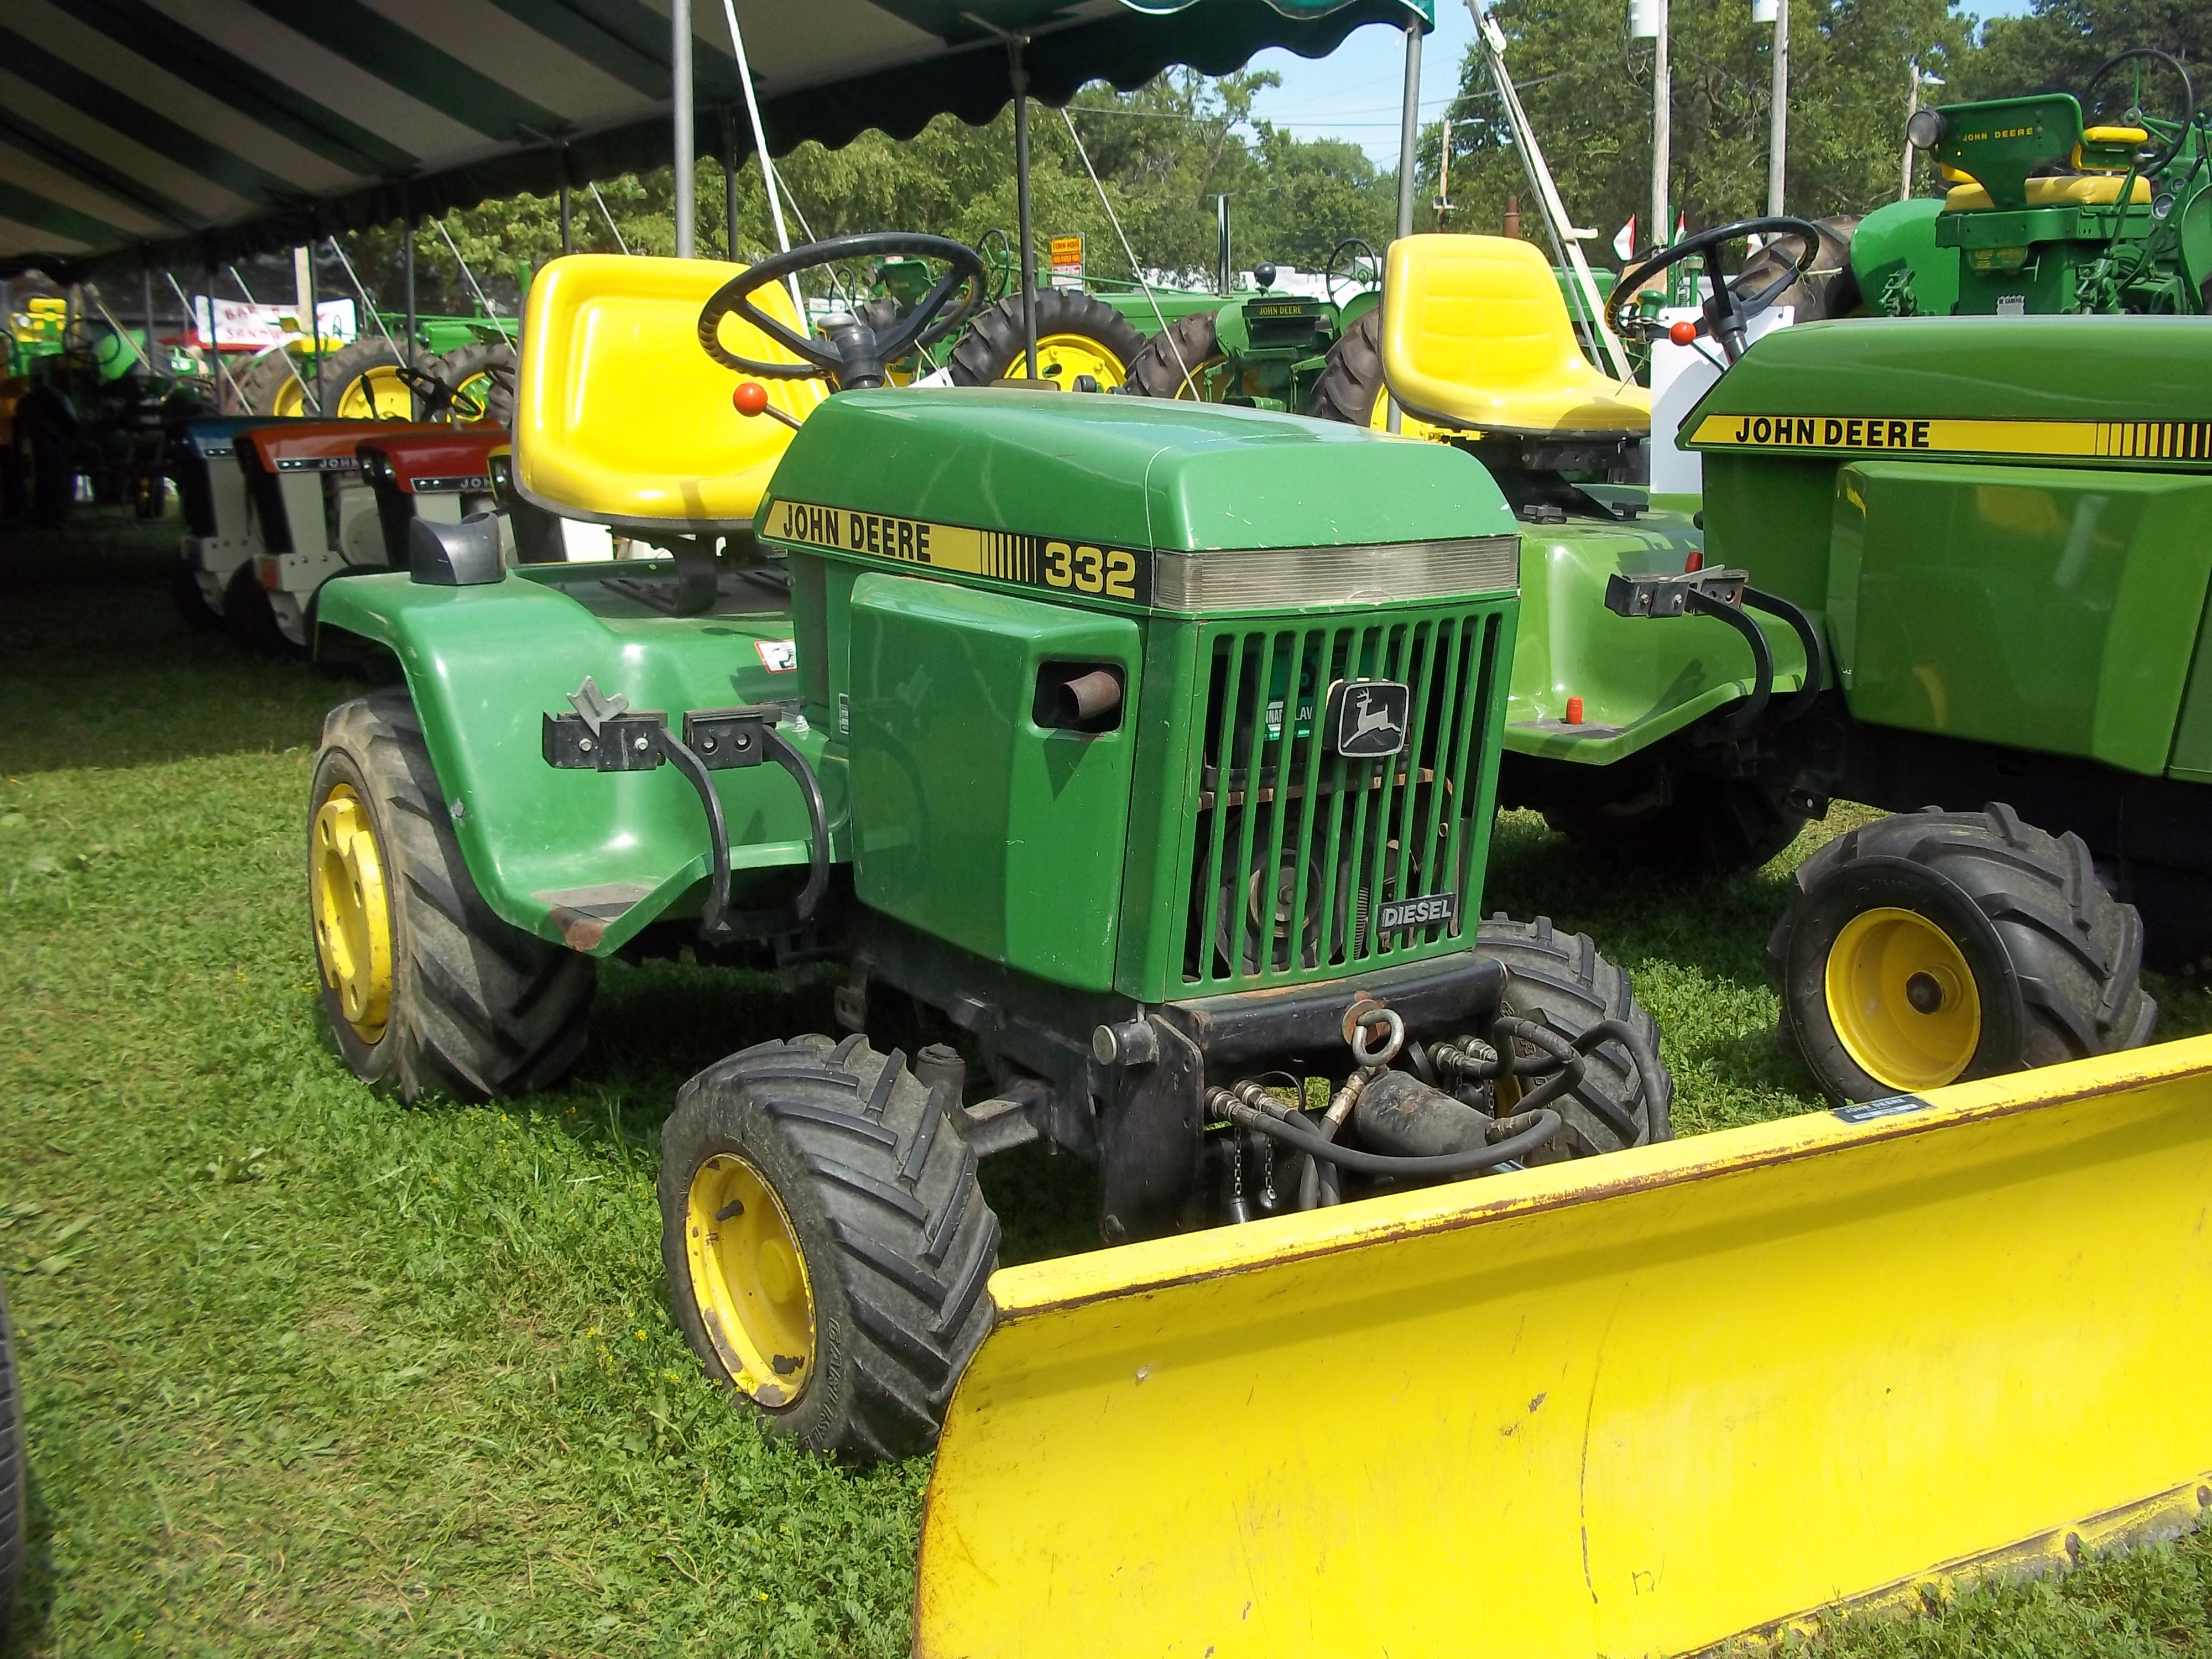 John Deere 332 >> 332 With Yellow Bulldozer Blade John Deere Equipment John Deere